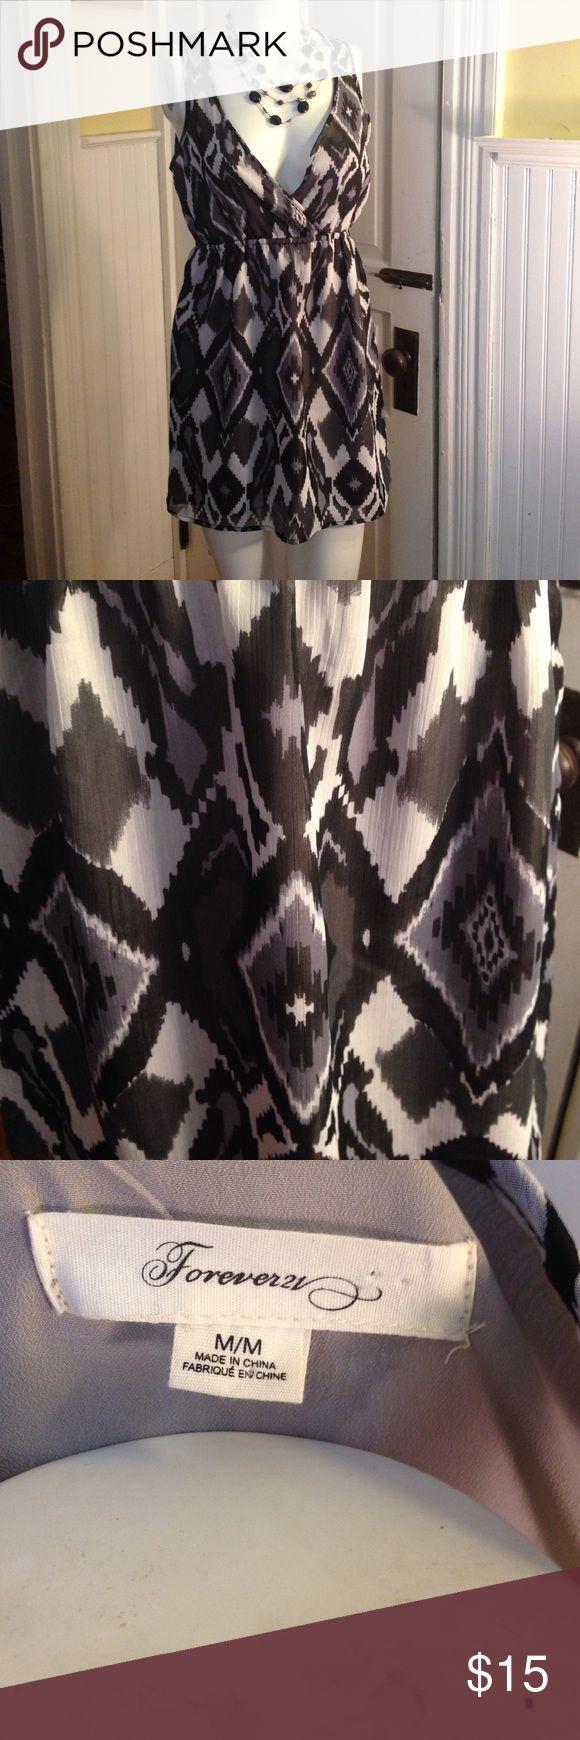 Black,white& gray diamond pattern short dress Med. Black,white& gray diamond pattern short dress Med. Forever 21 brand great condition. Low cut v neck. Size medium. Good condition Forever 21 Dresses Mini